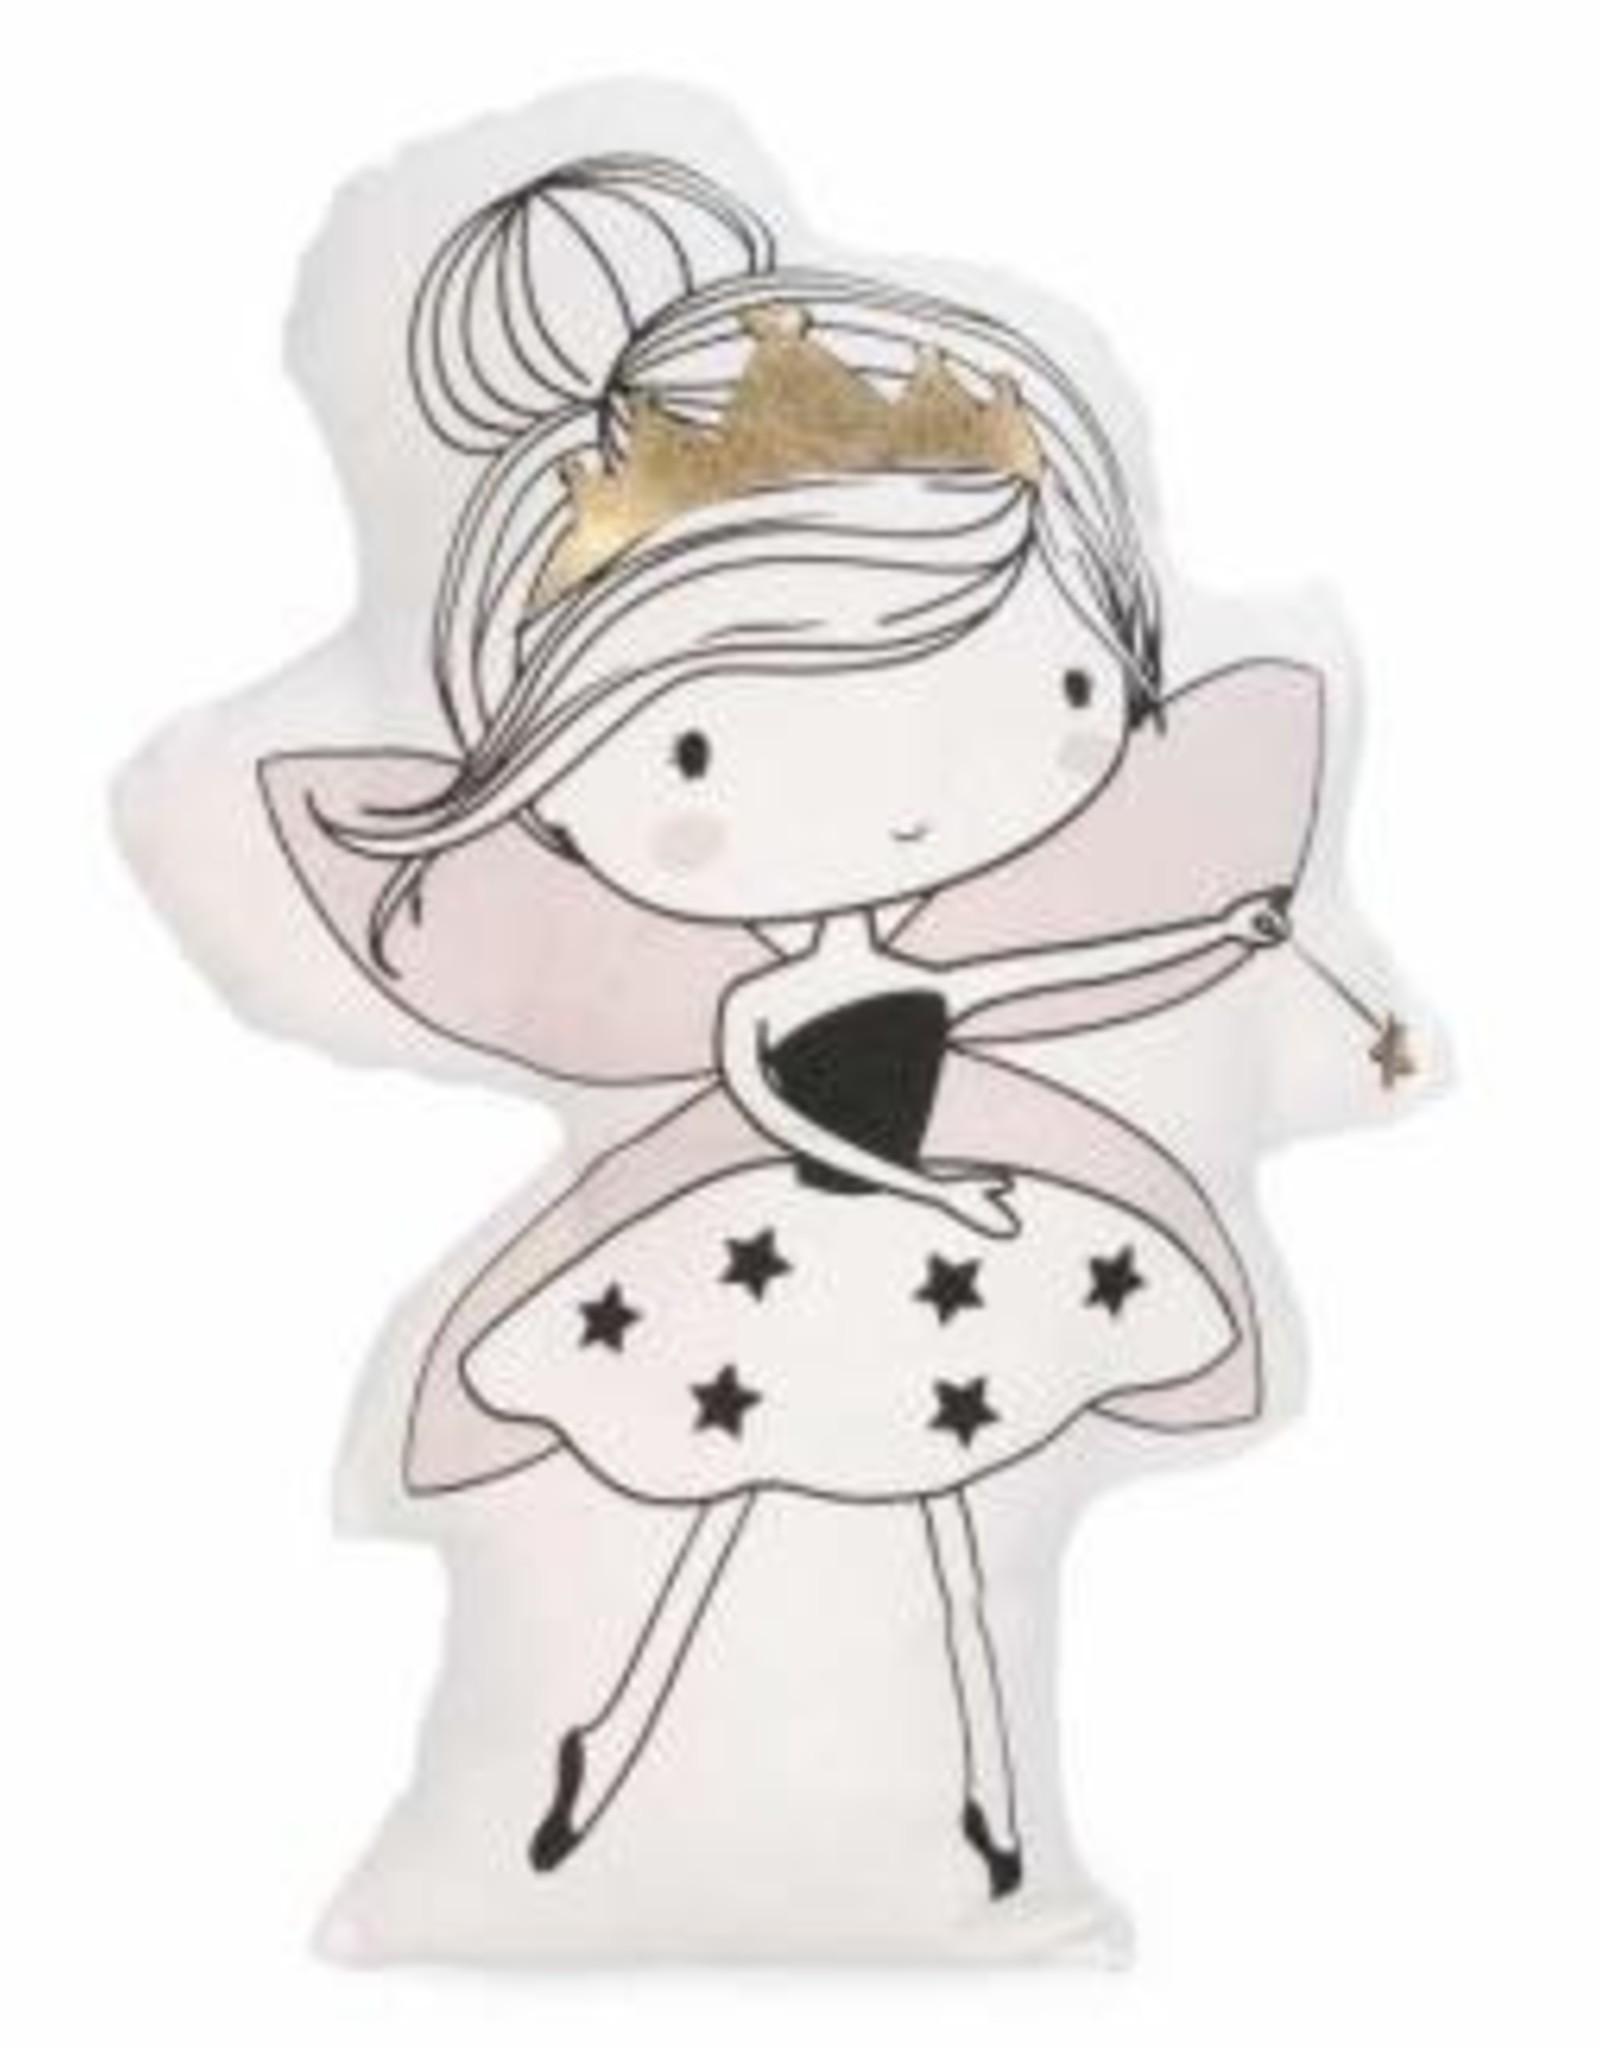 Fairy Pillow